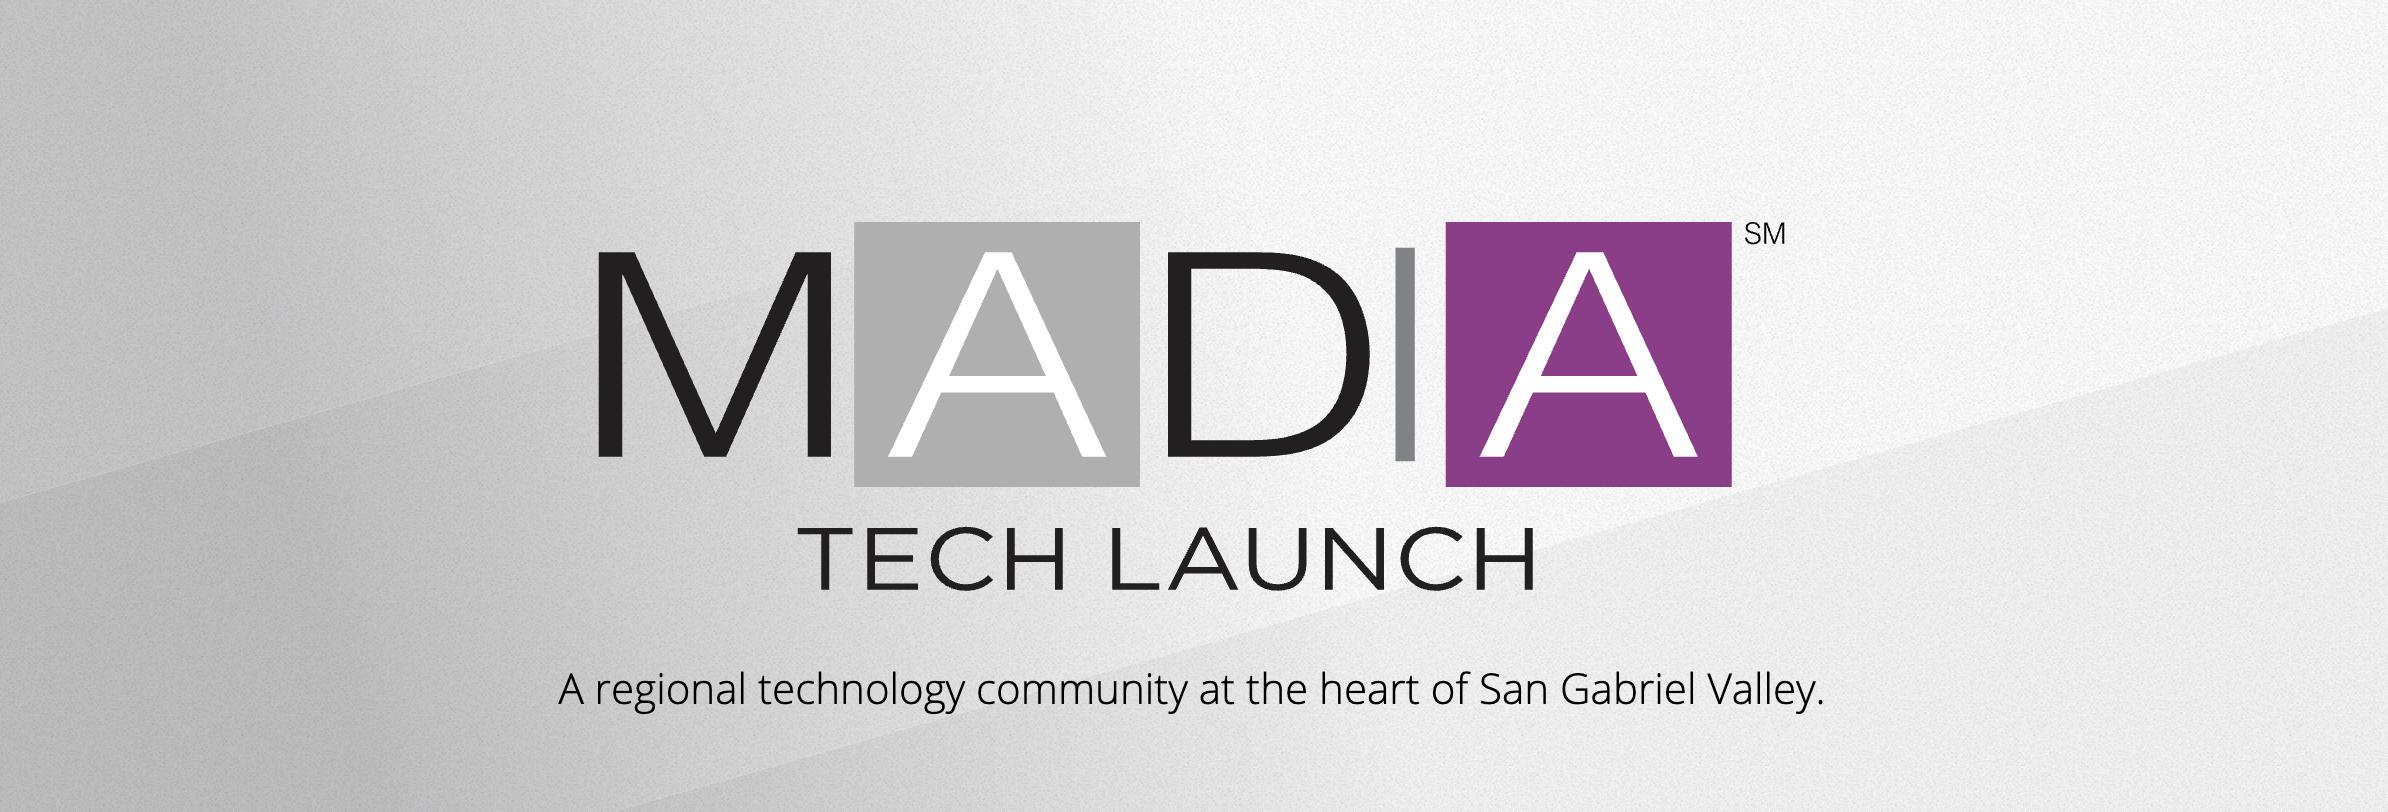 MADIA Tech Launch Inc.